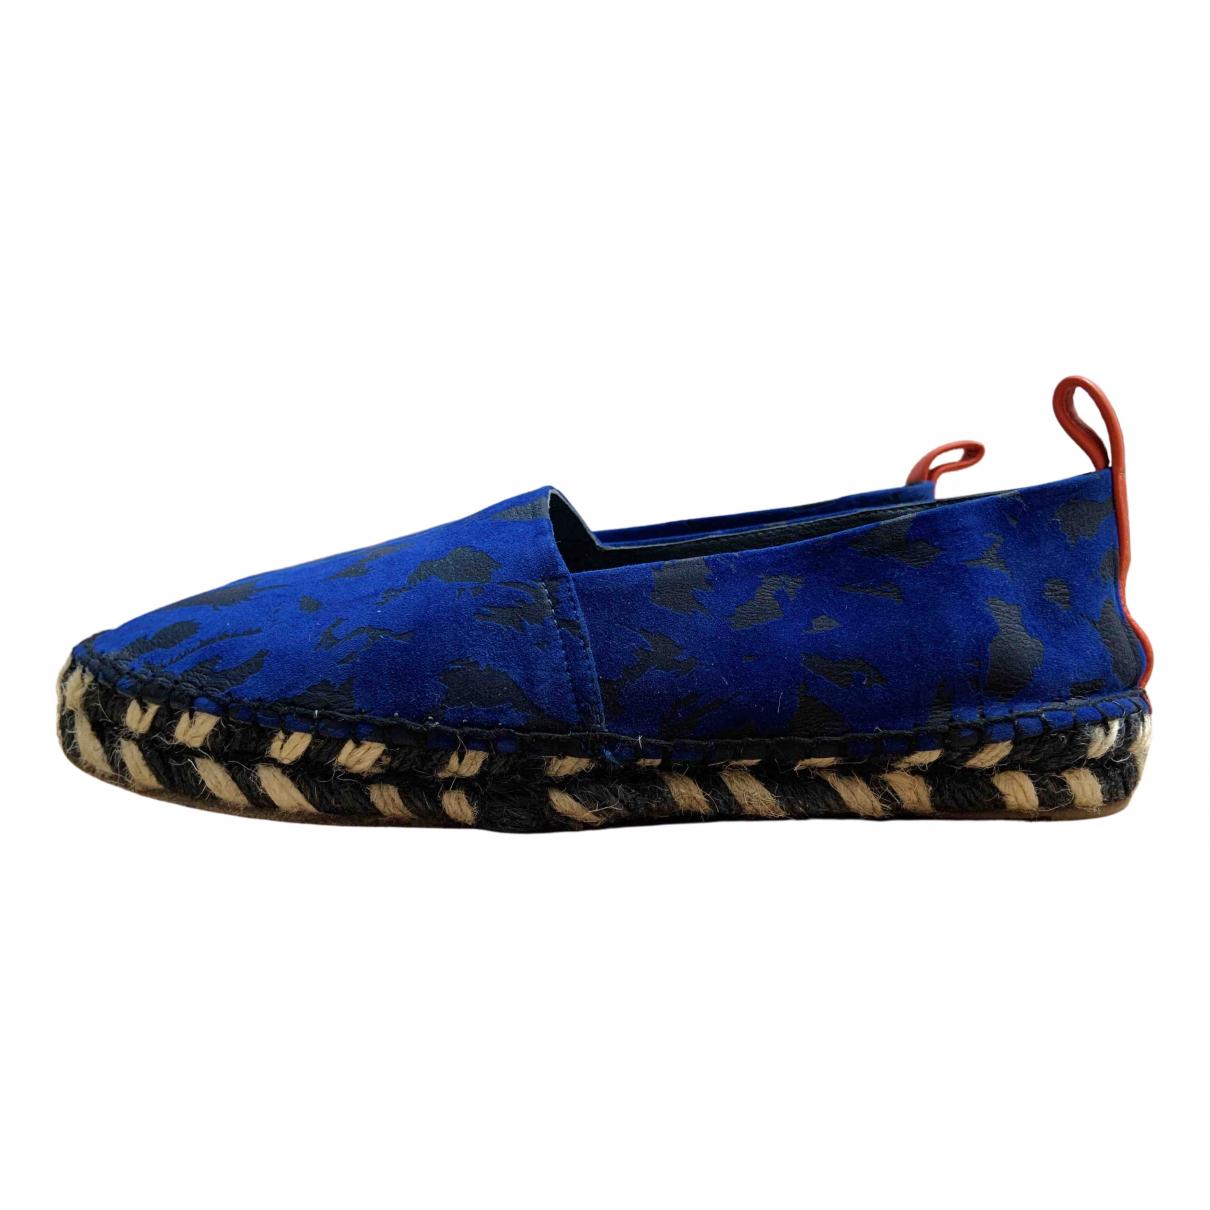 Proenza Schouler \N Espadrilles in  Blau Leder